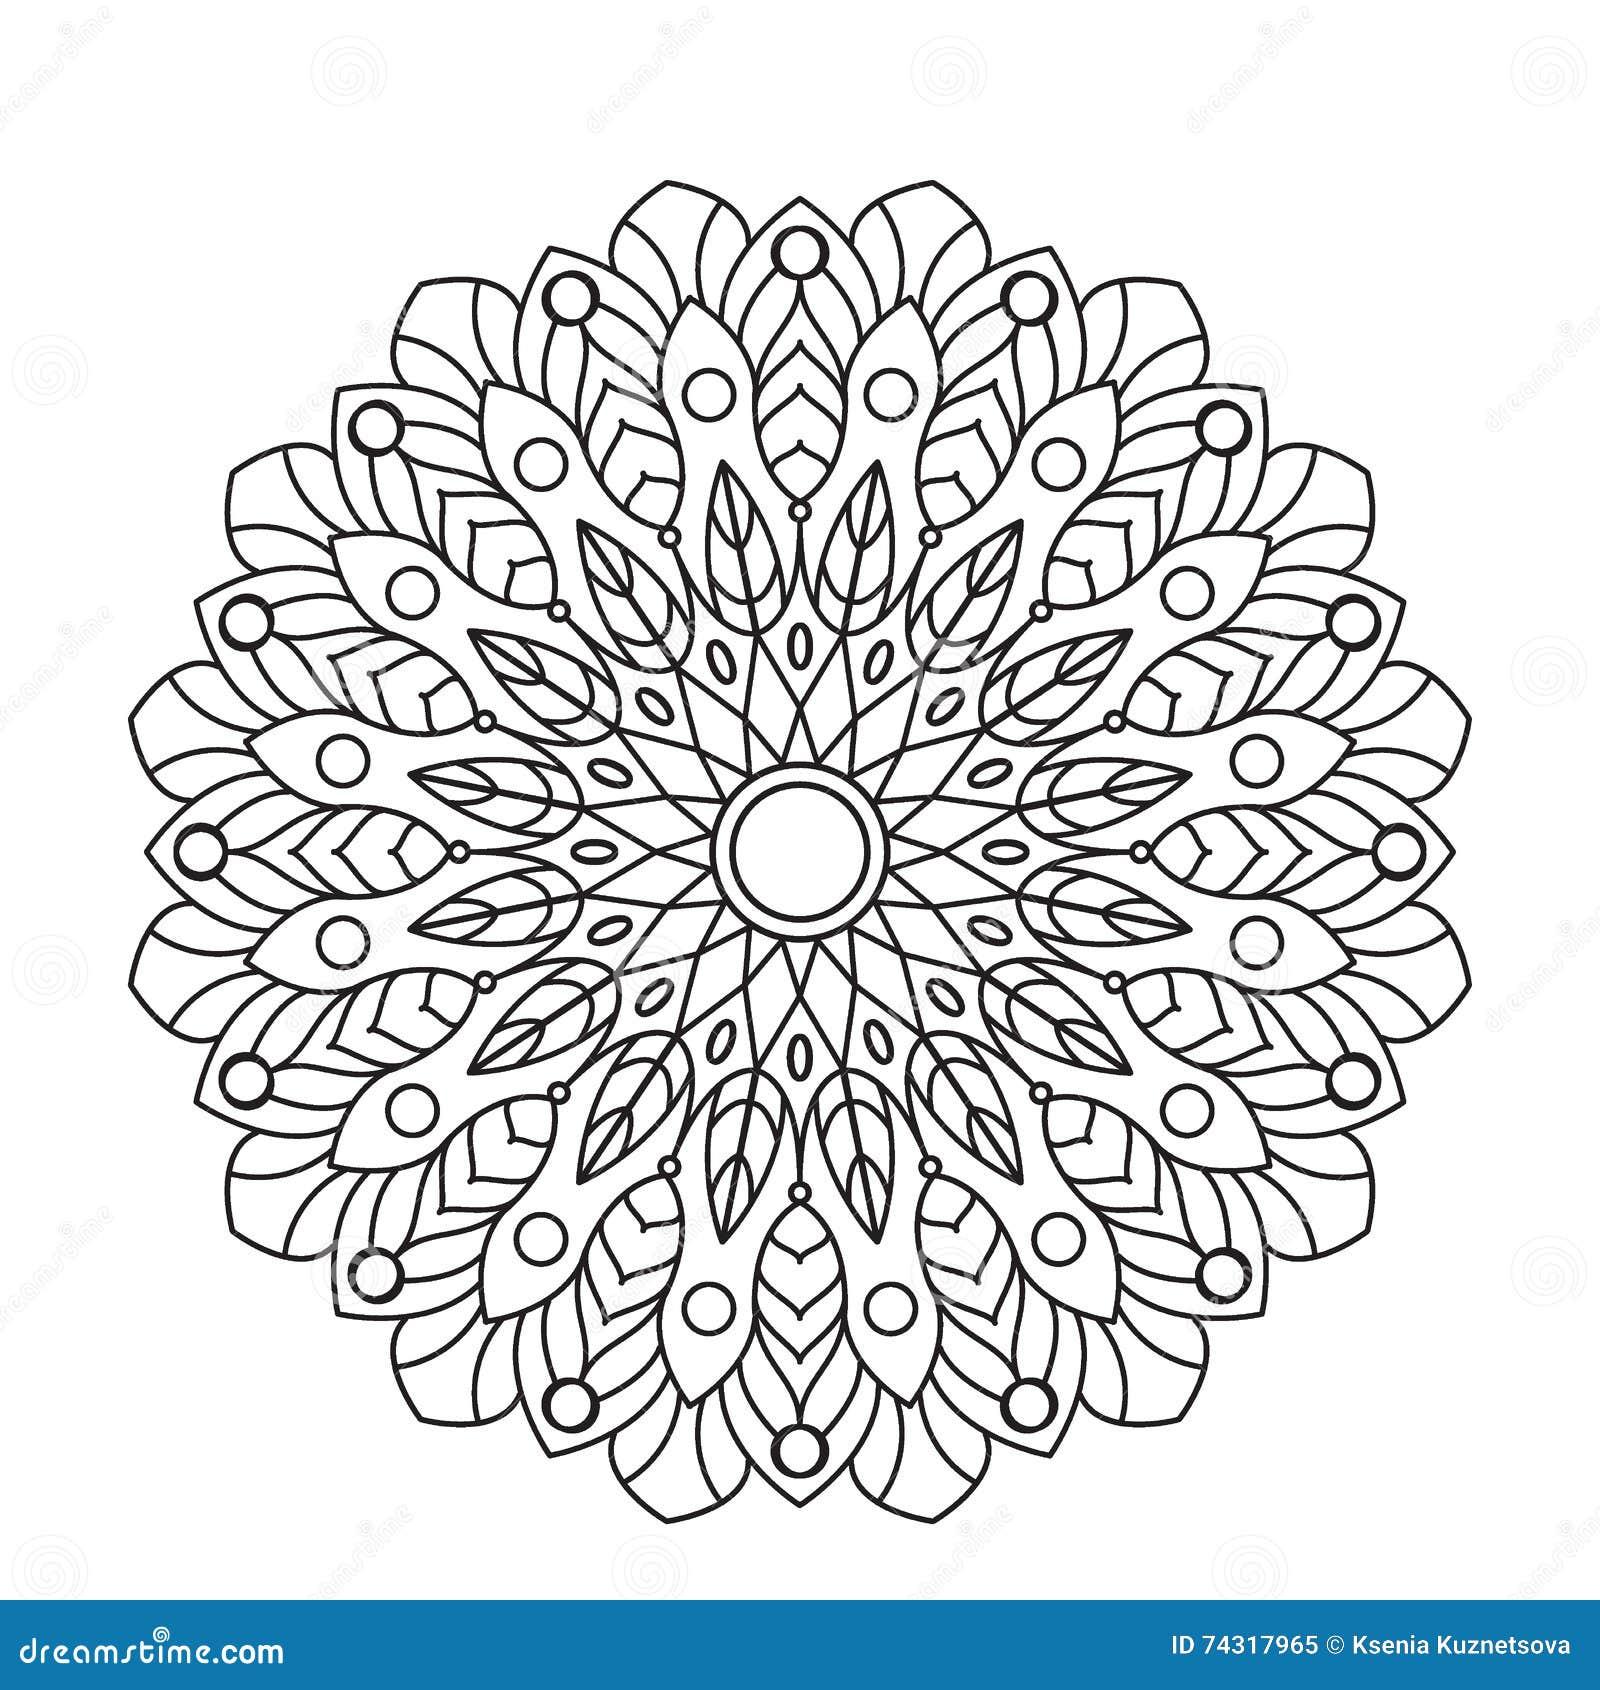 Coloring Book Mandala. Circle lace ornament, round ornamental pattern ...